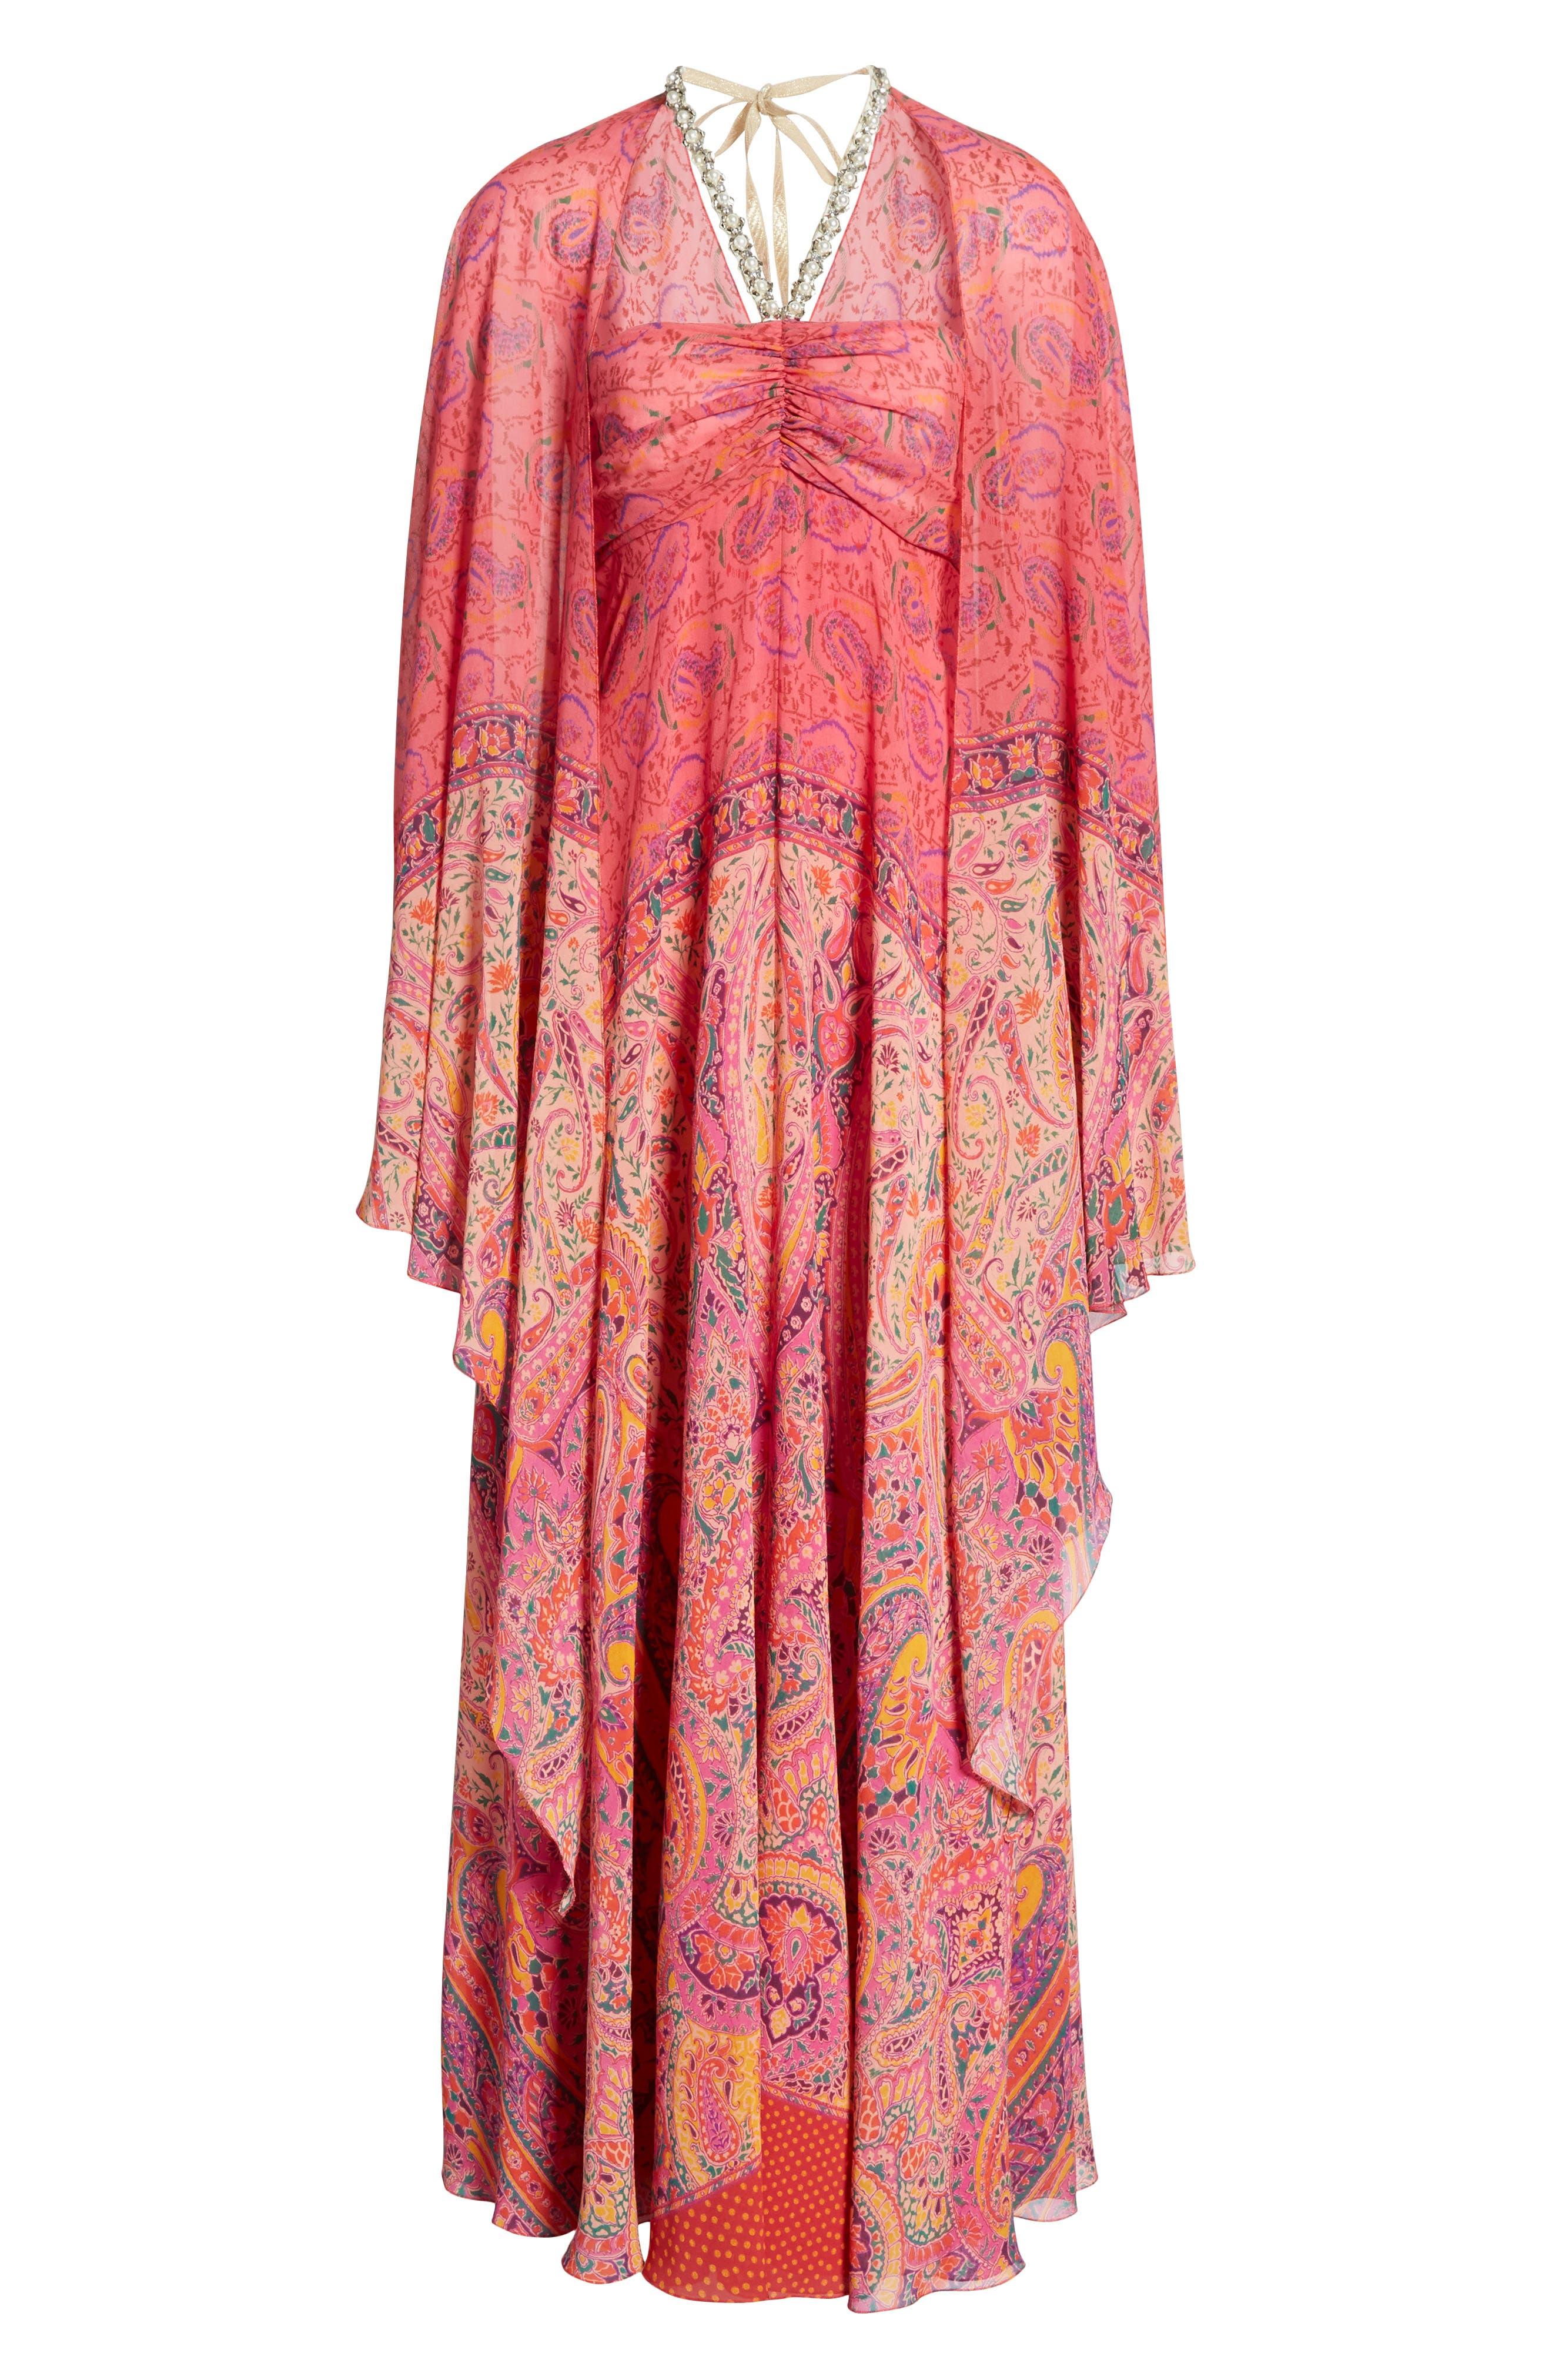 Beaded Halter Neck Silk Maxi Dress with Cape,                             Alternate thumbnail 6, color,                             650